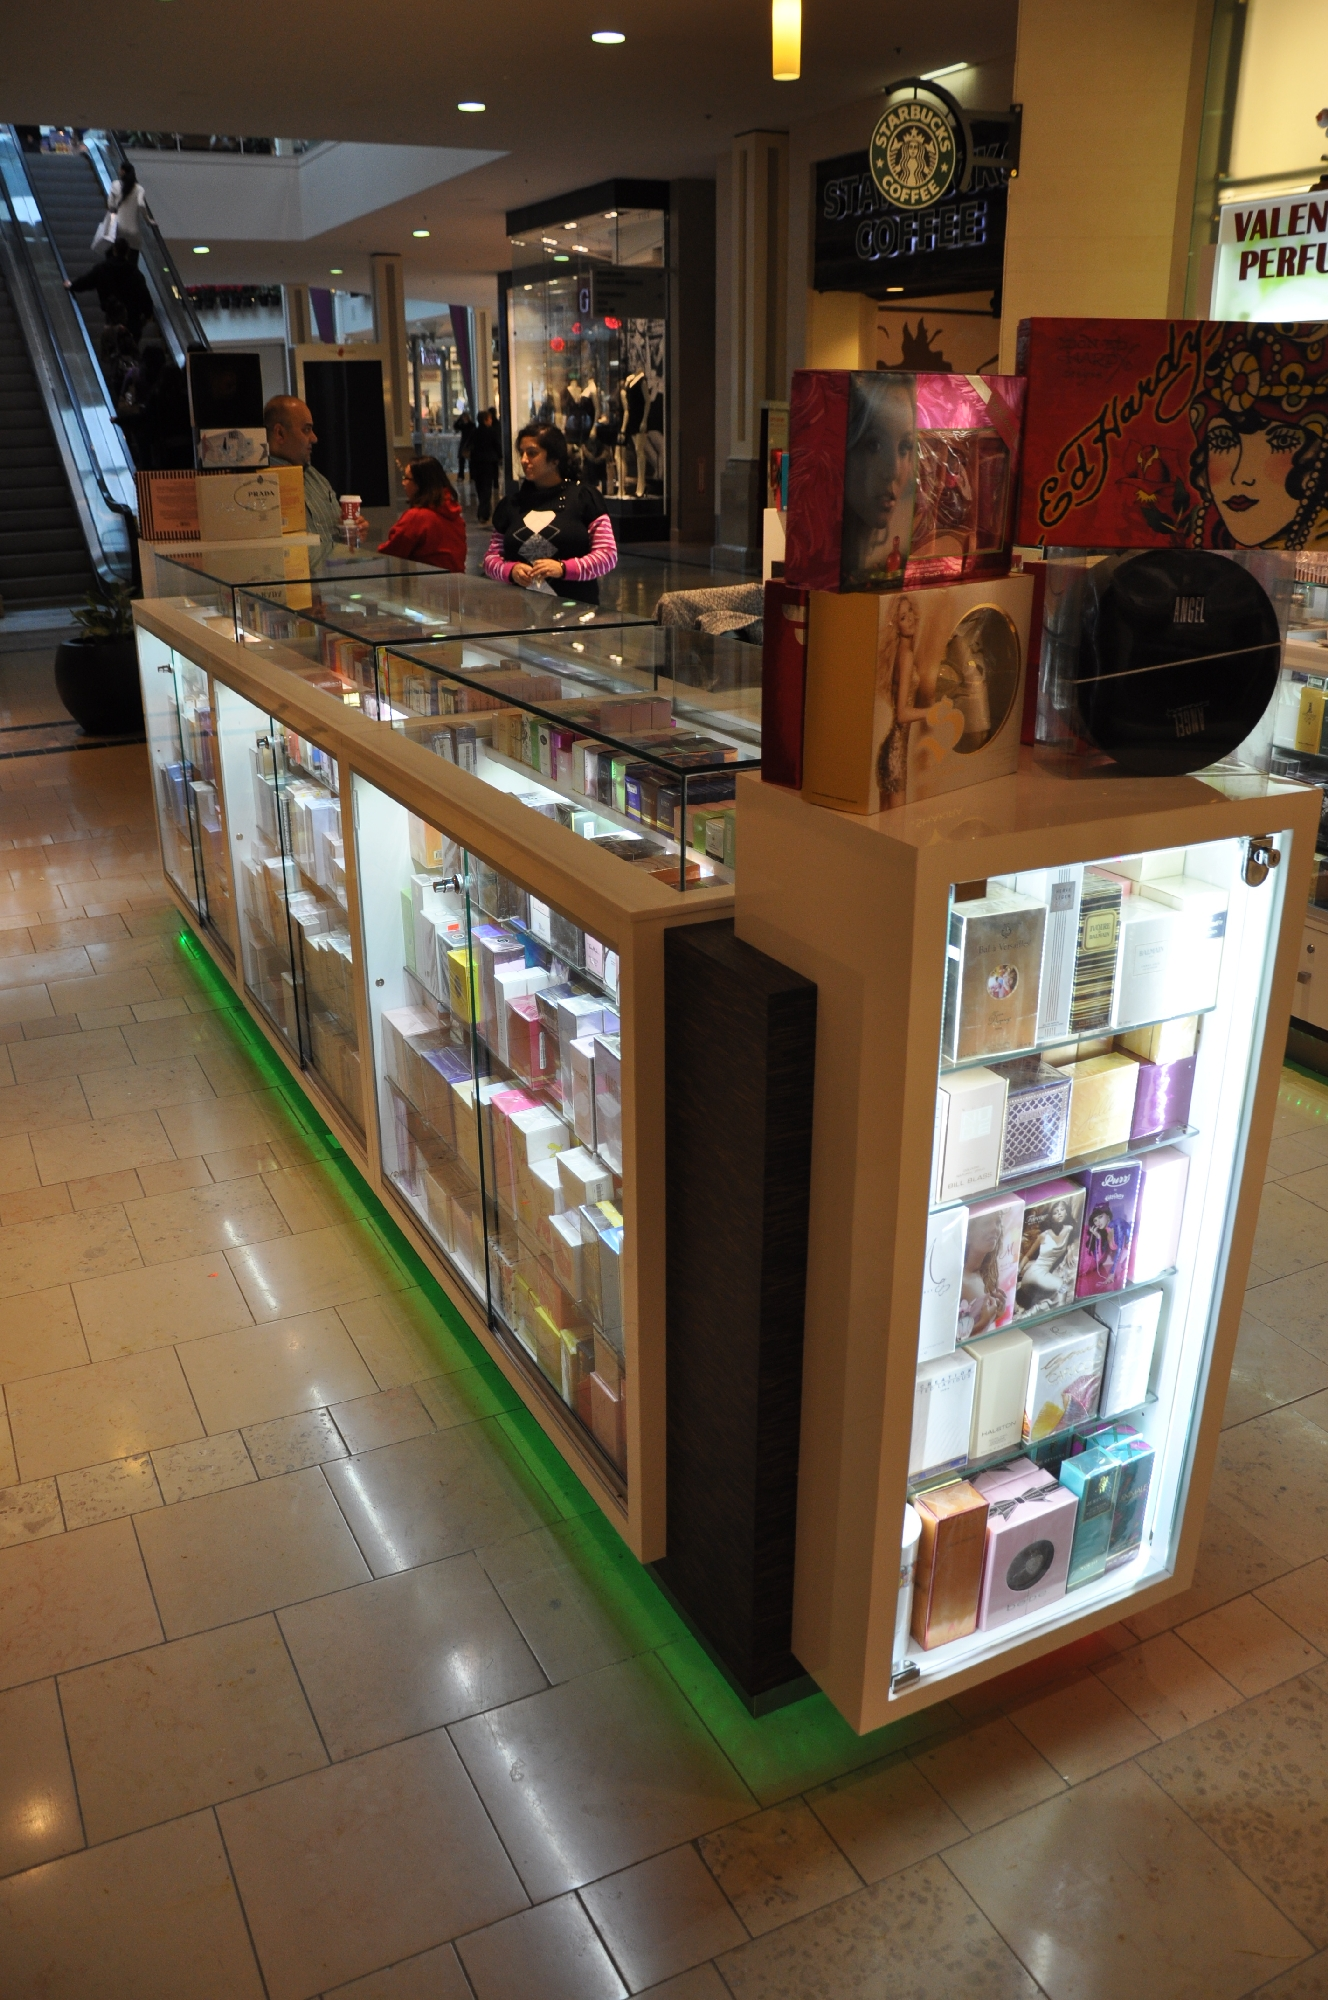 Valentine Perfume Kiosk BWC - Resize _03.jpg